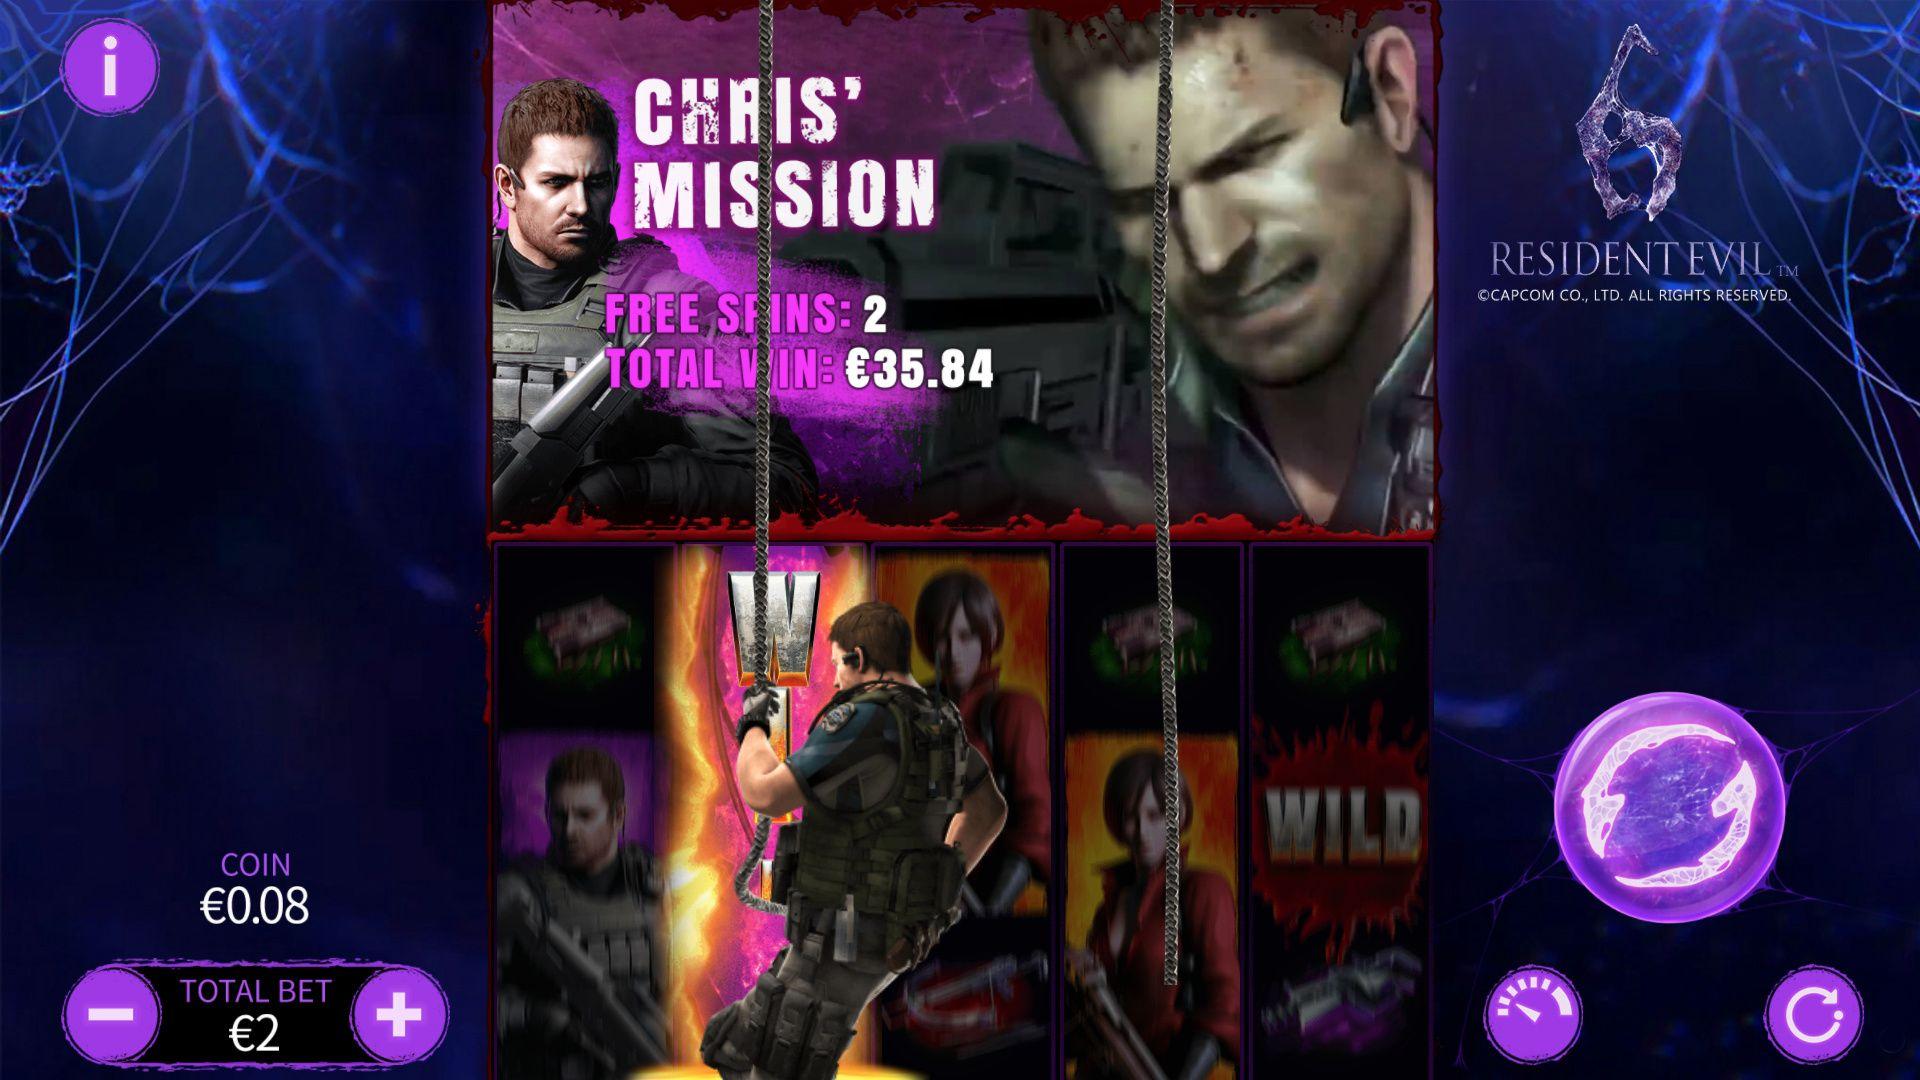 Chris's Mission: Rappel Expanding Wilds